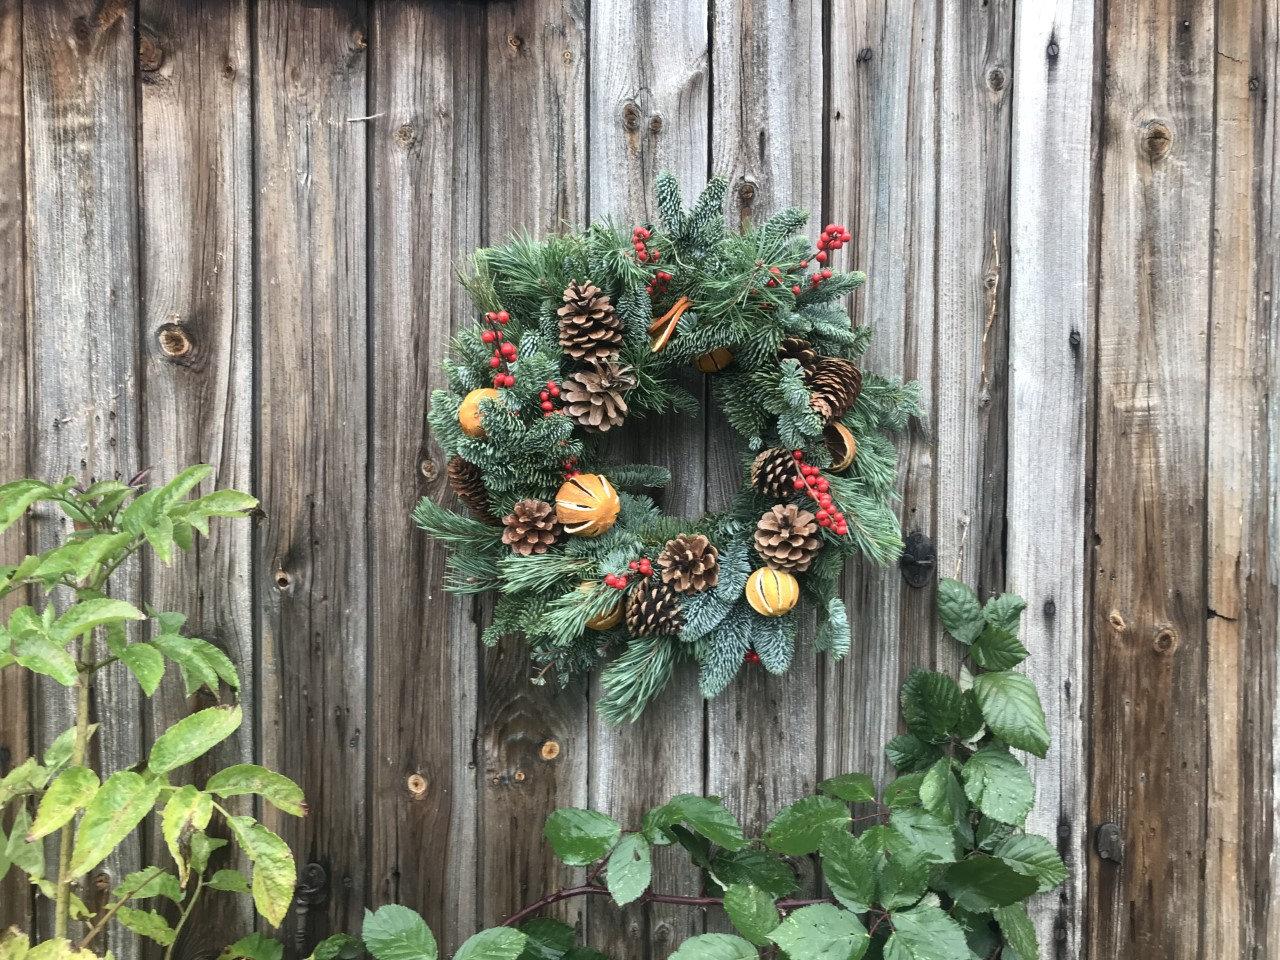 Christmas Wreath Making at The Mixer